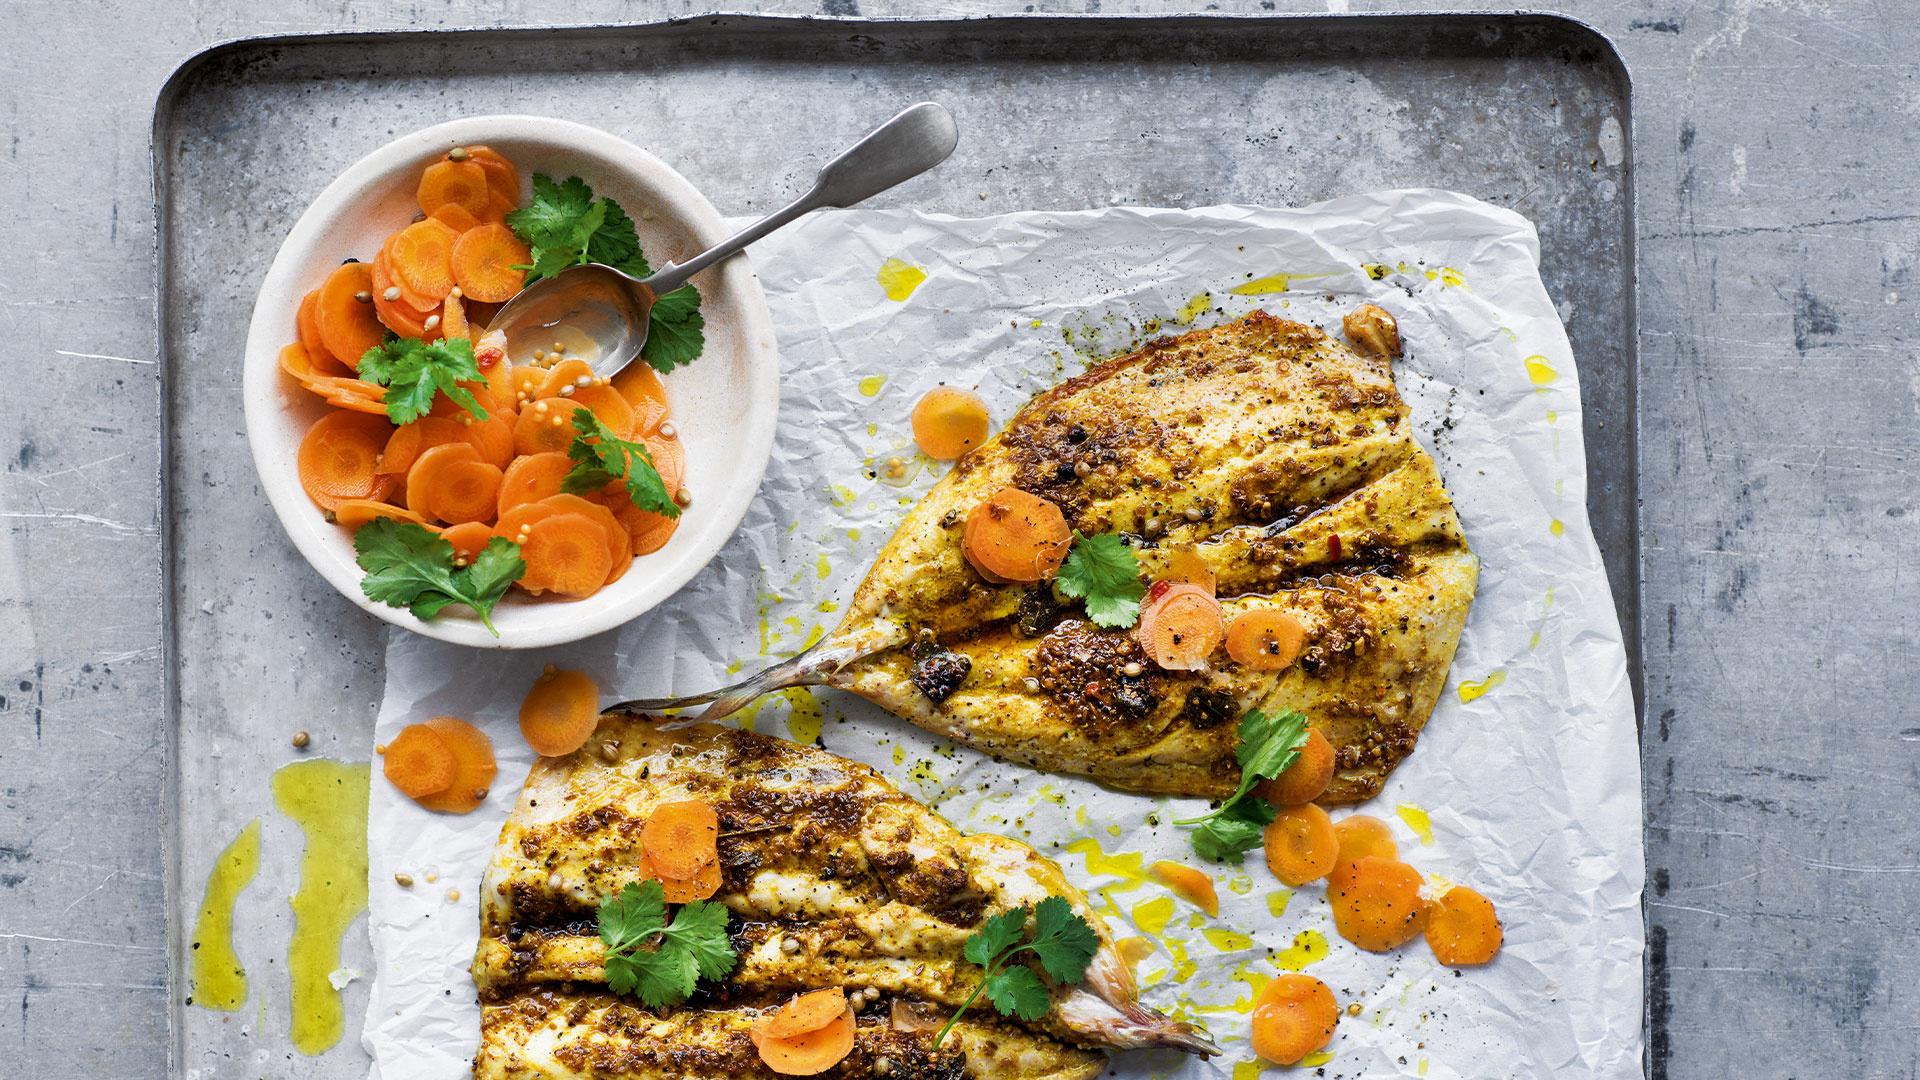 Borough Market's spiced mackerel